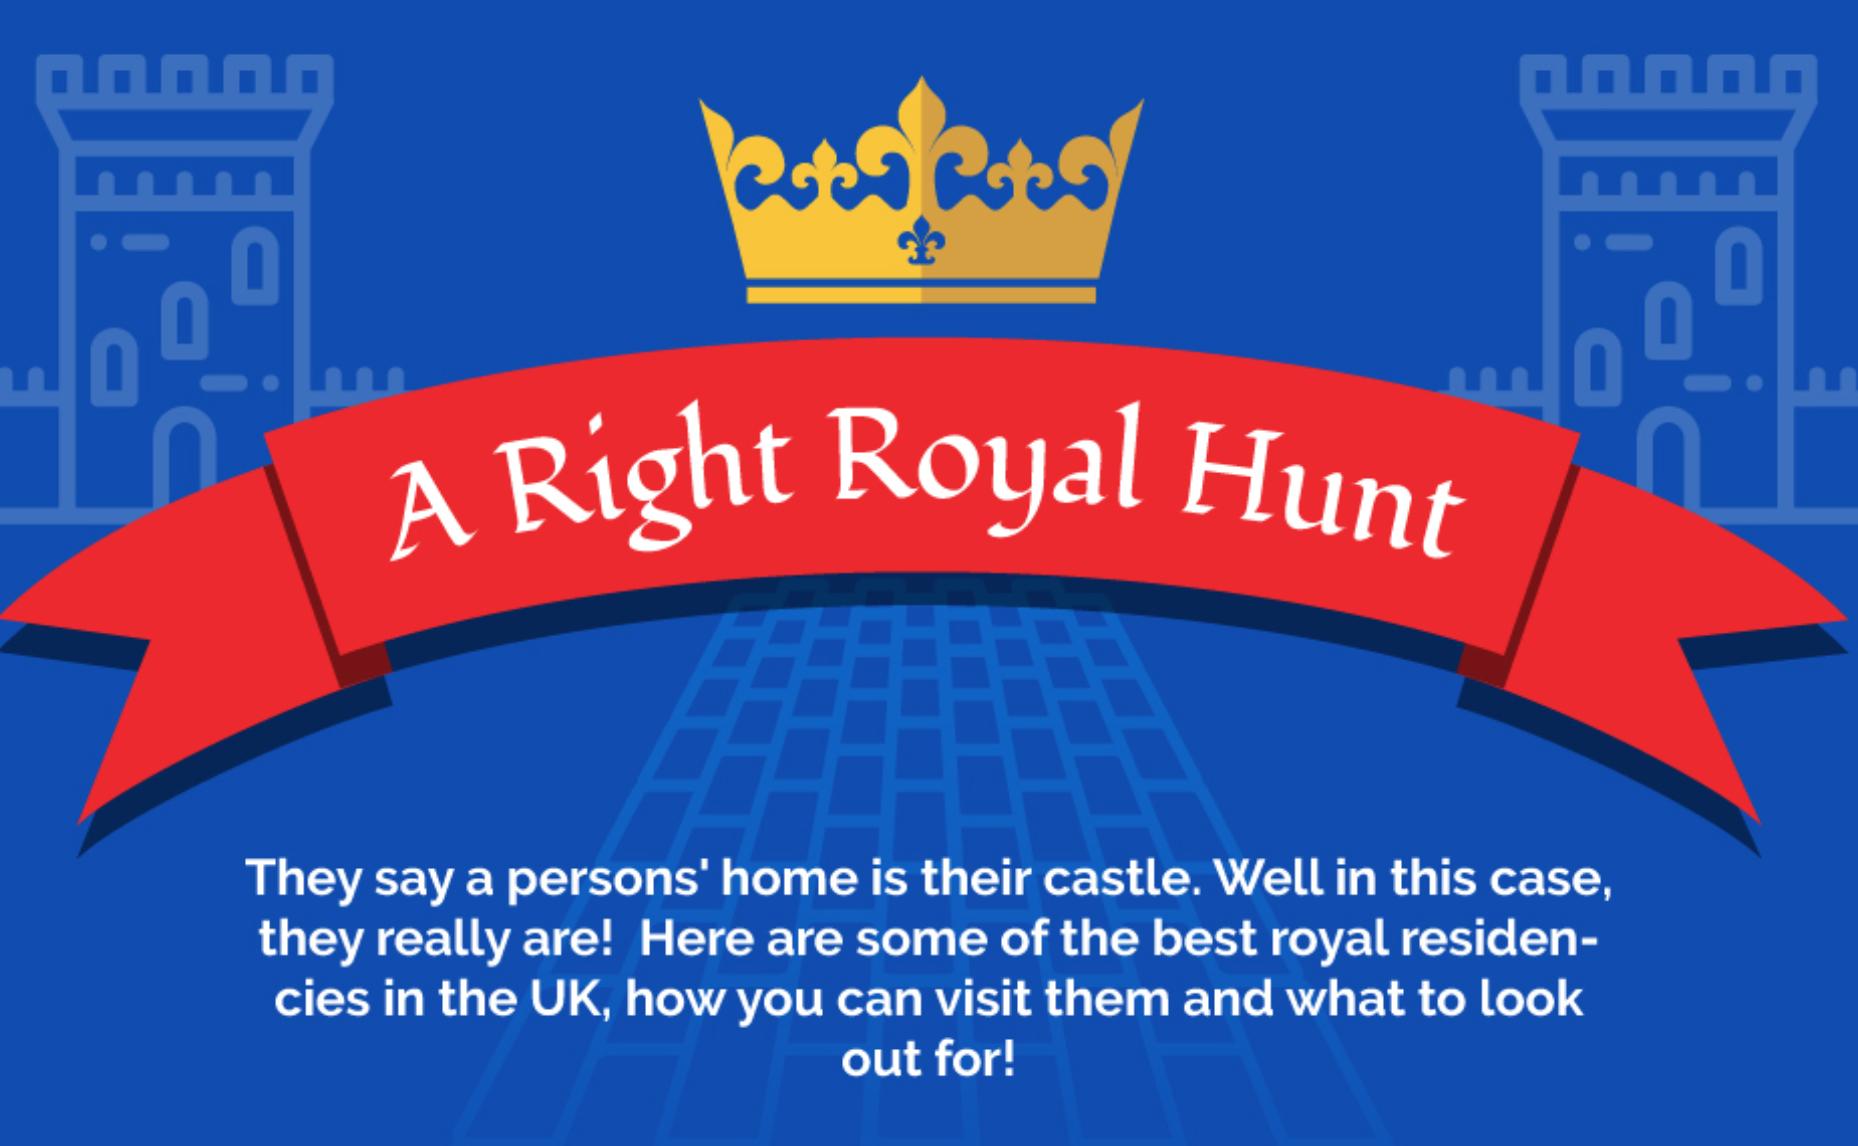 Exploring Royal Residences in the UK